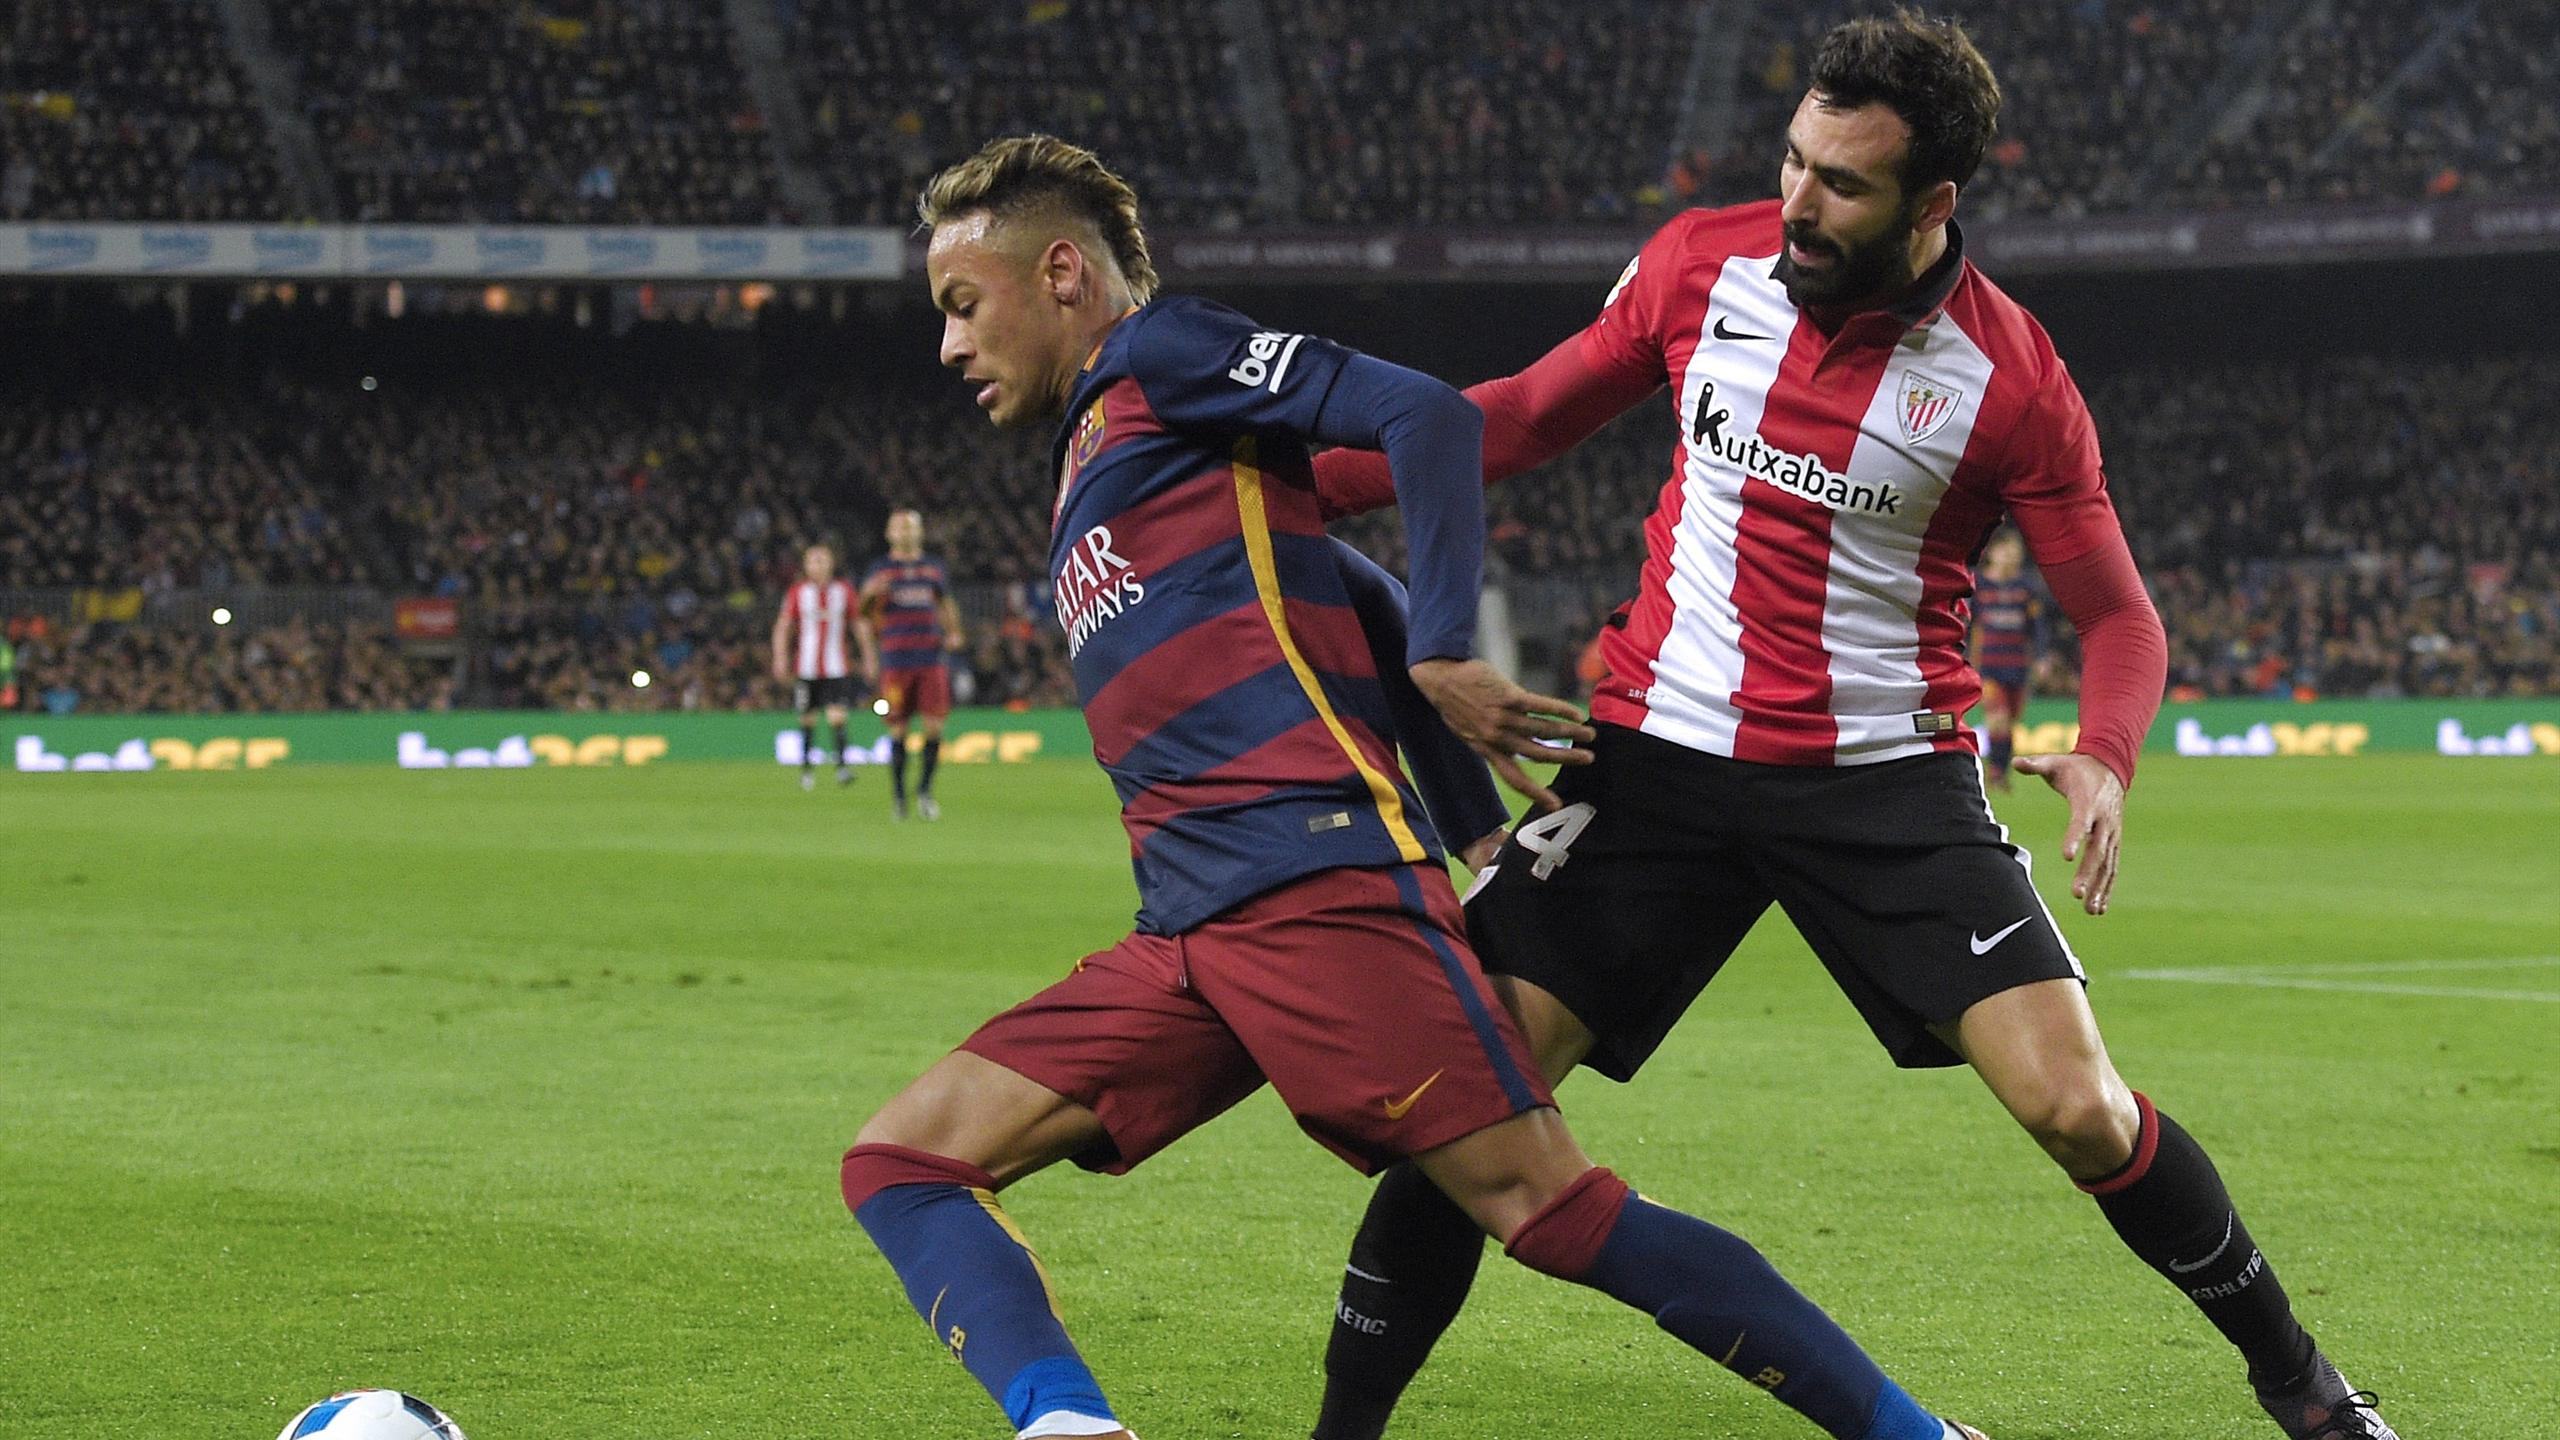 mundialito club espana: